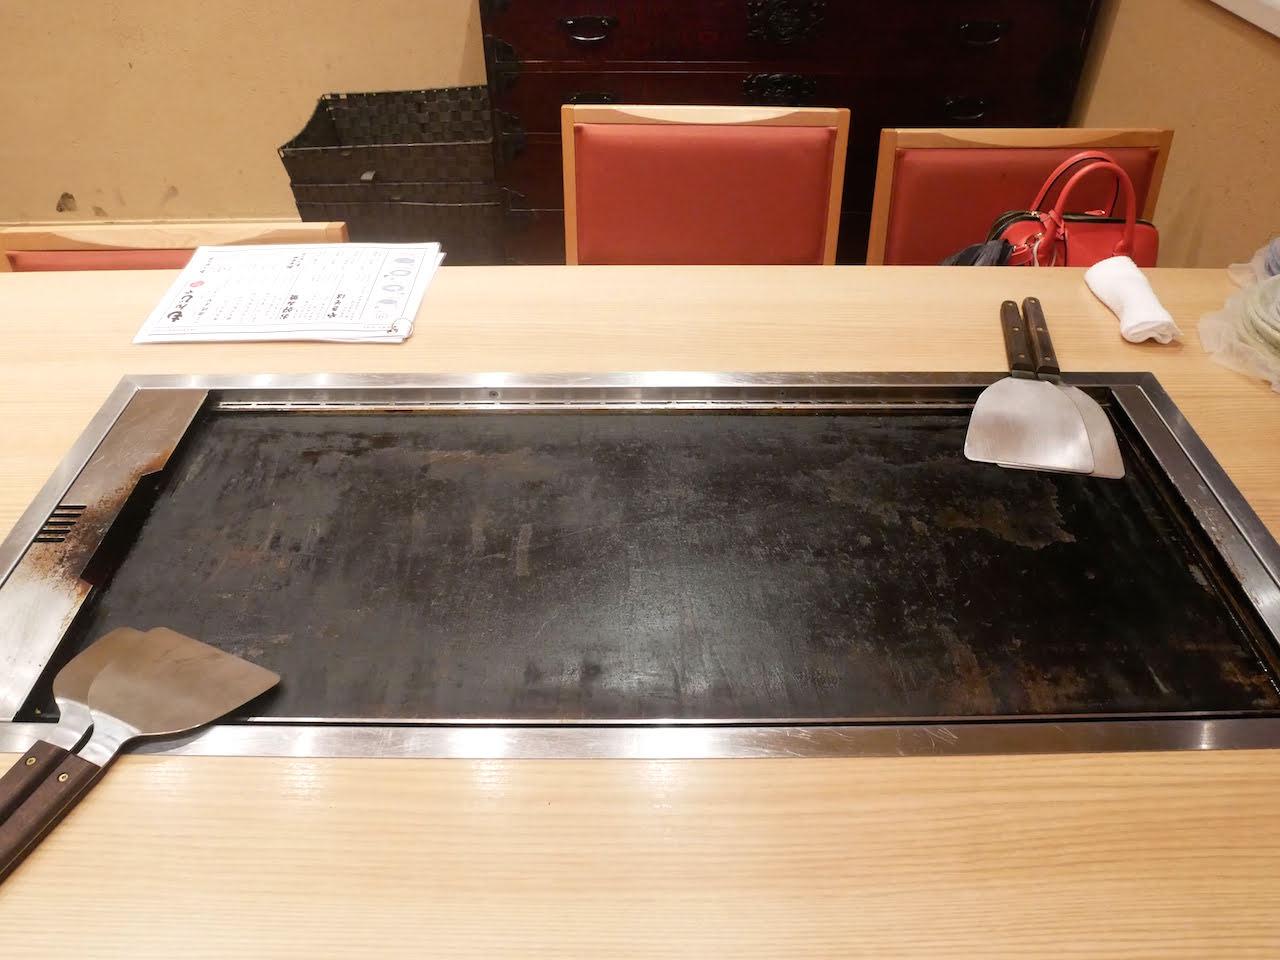 http://dinner.tokyo-review.com/images/1090405.jpg